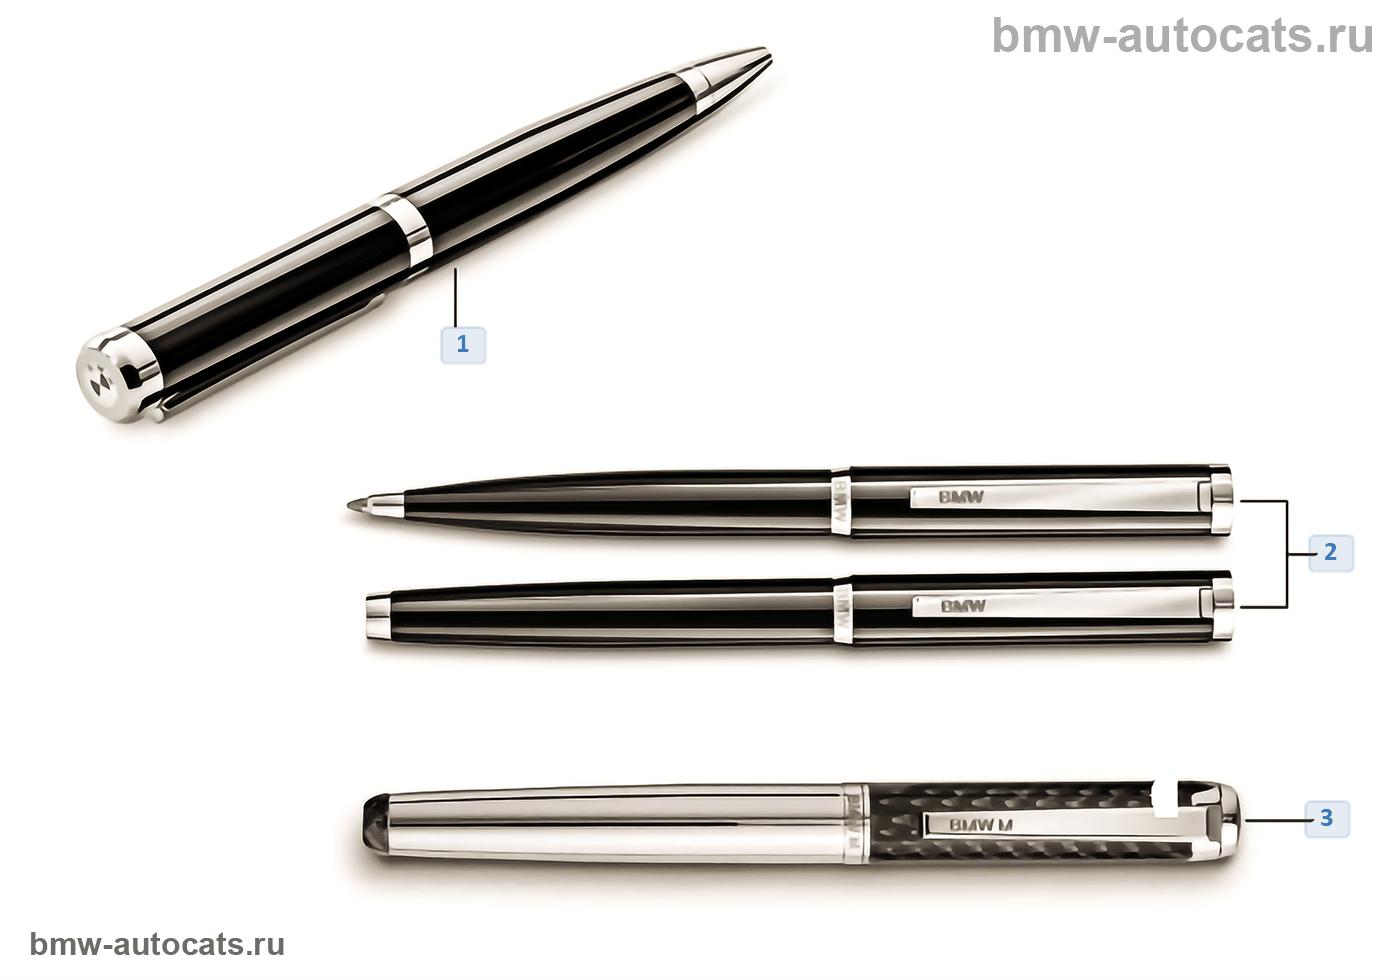 BMW Ersatzteile — Kugelschreiber